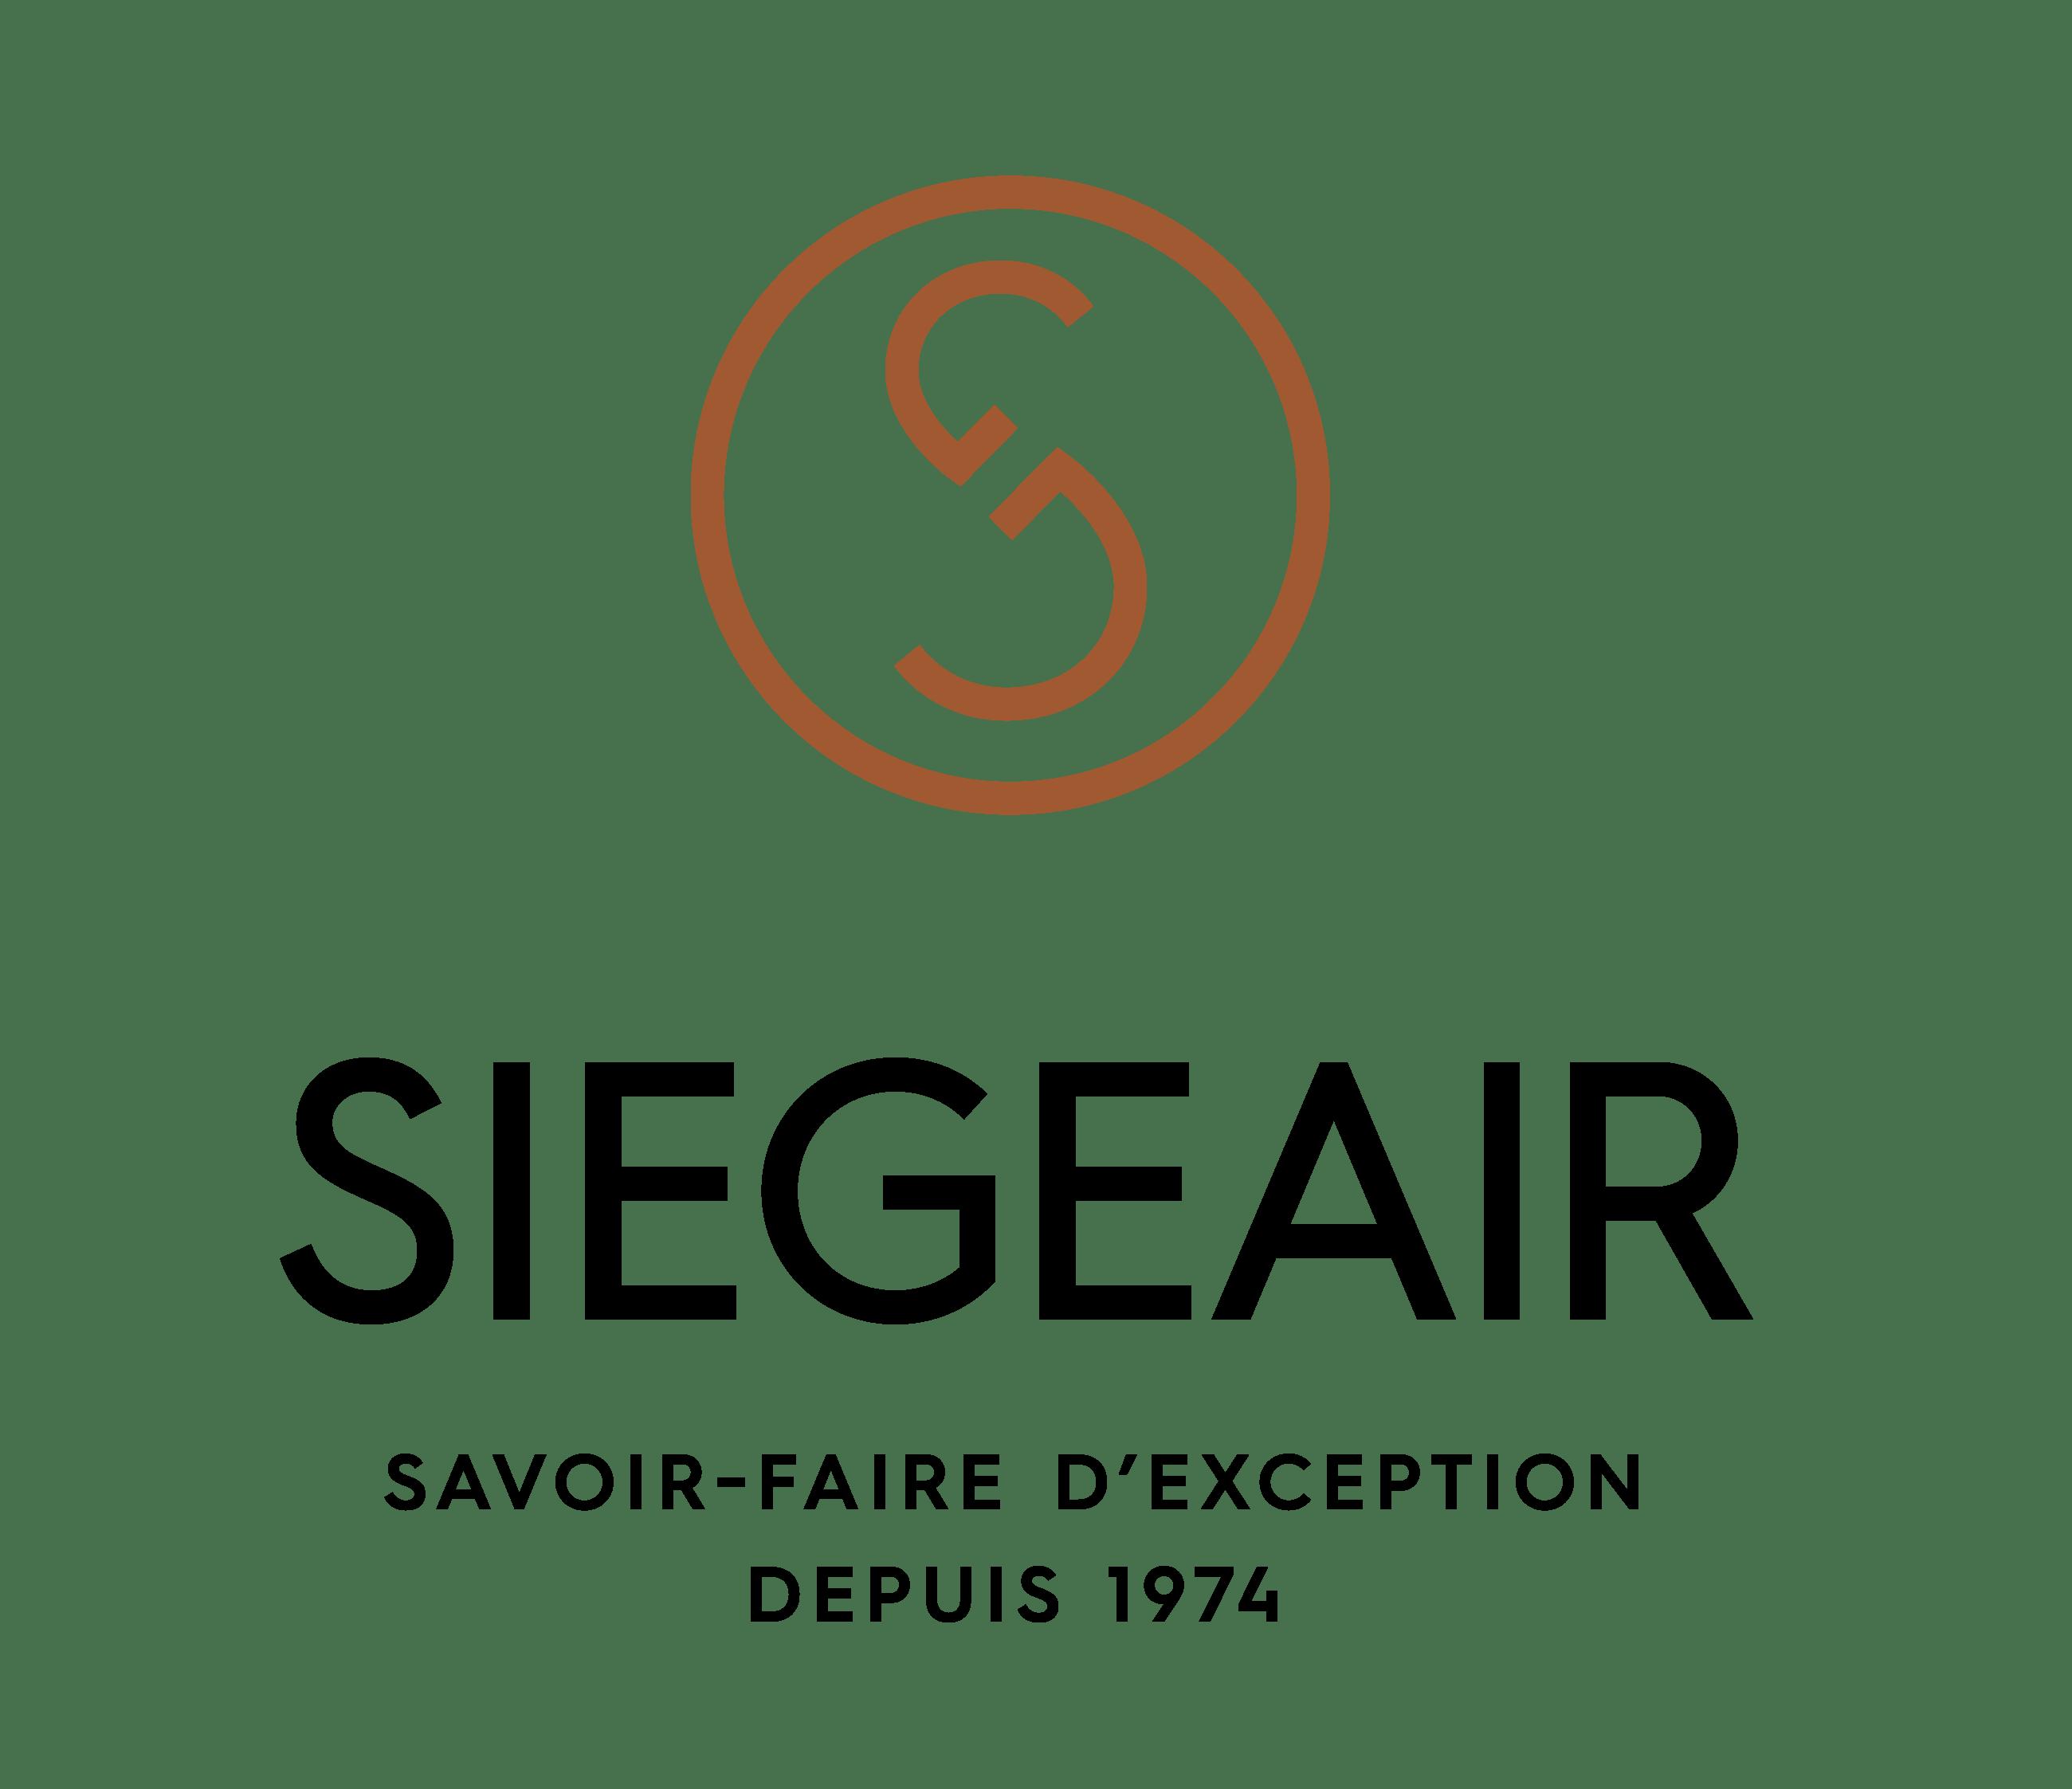 Siegeair